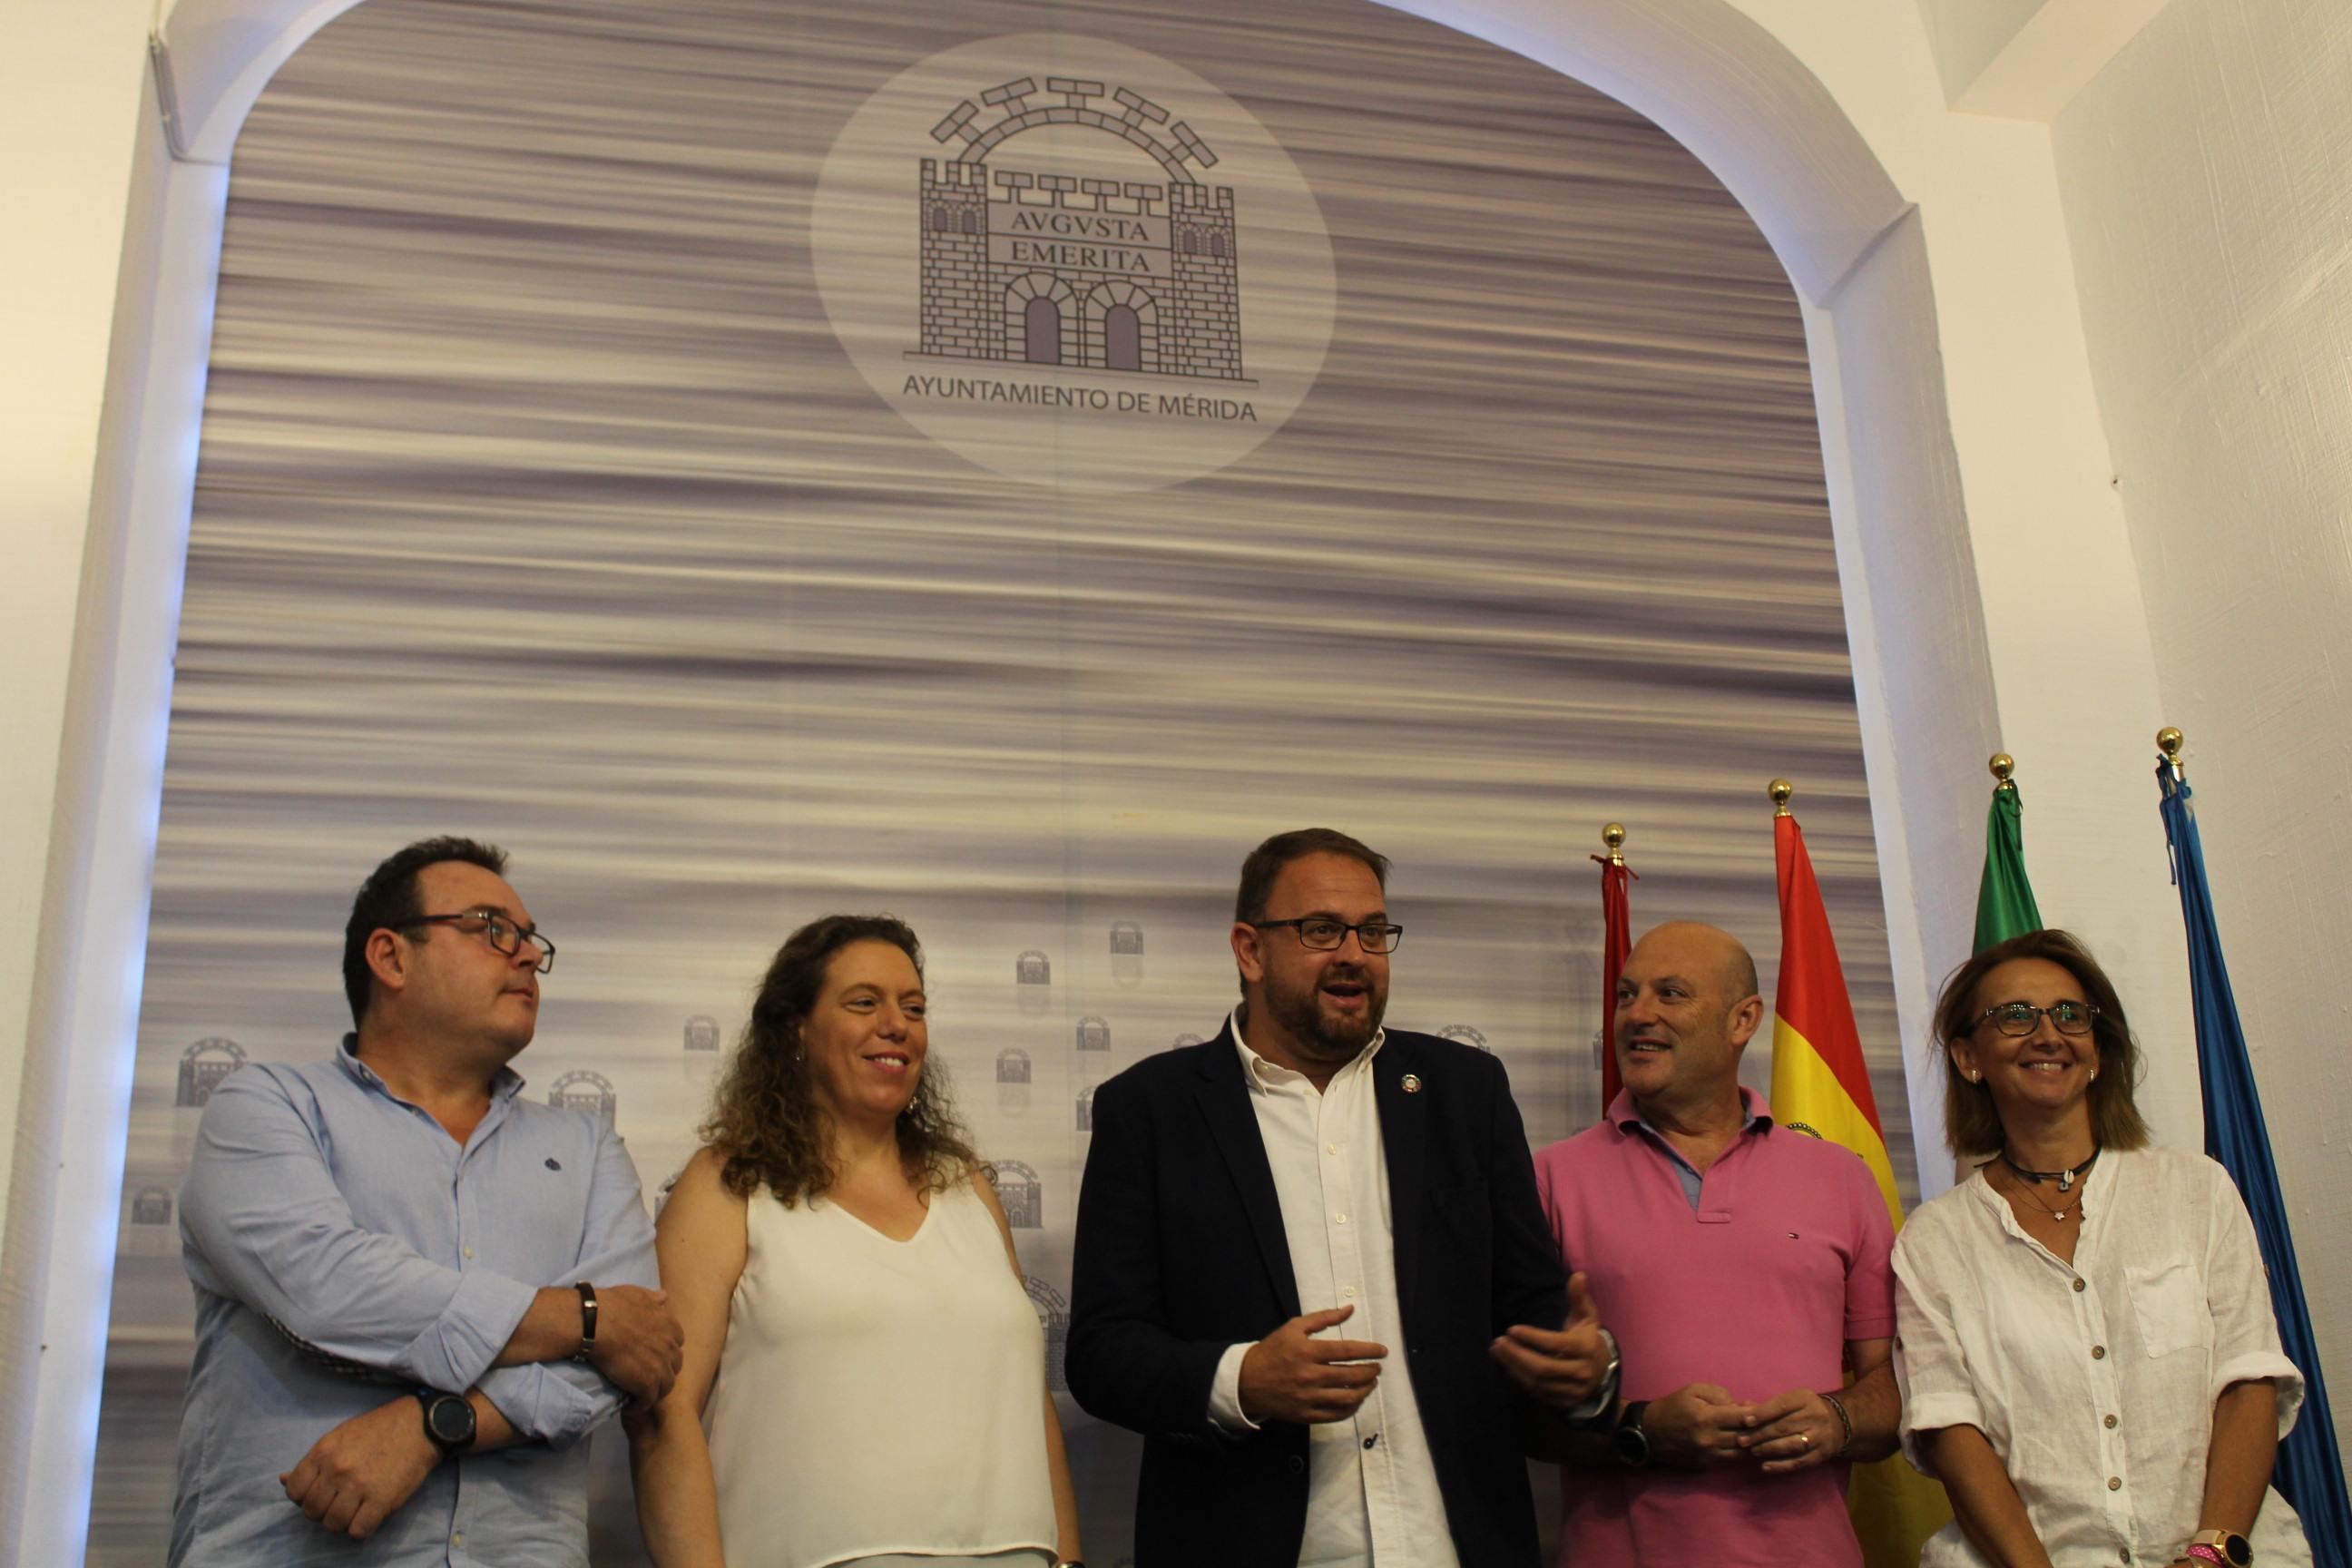 Concejales con alcalde osuna